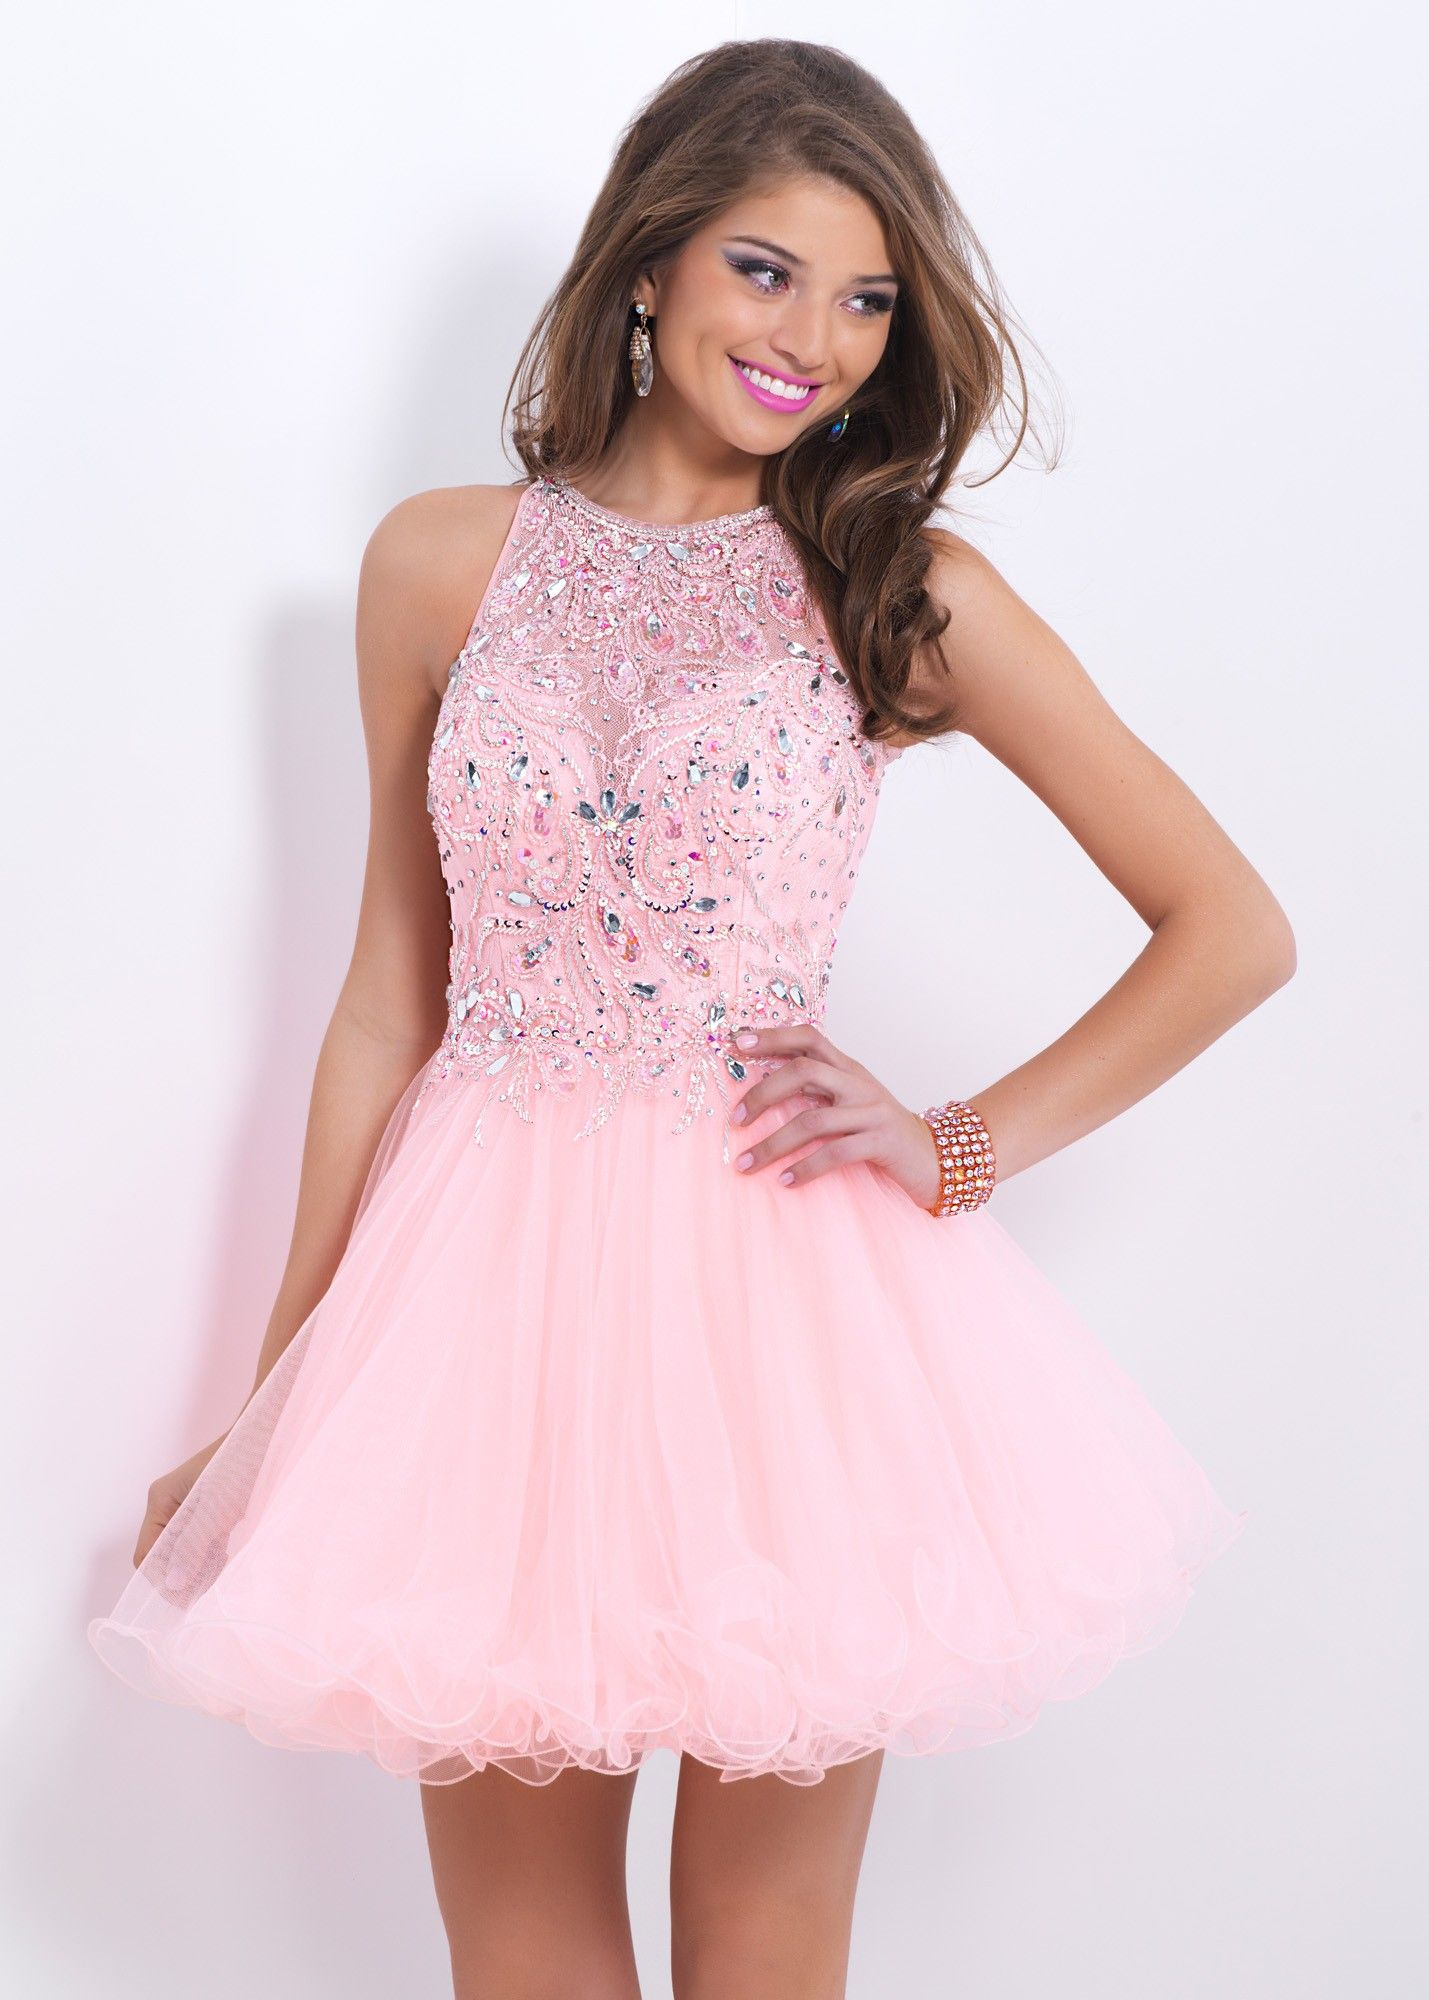 Blush Prom Illusion Cocktail Dress Homecomingprom